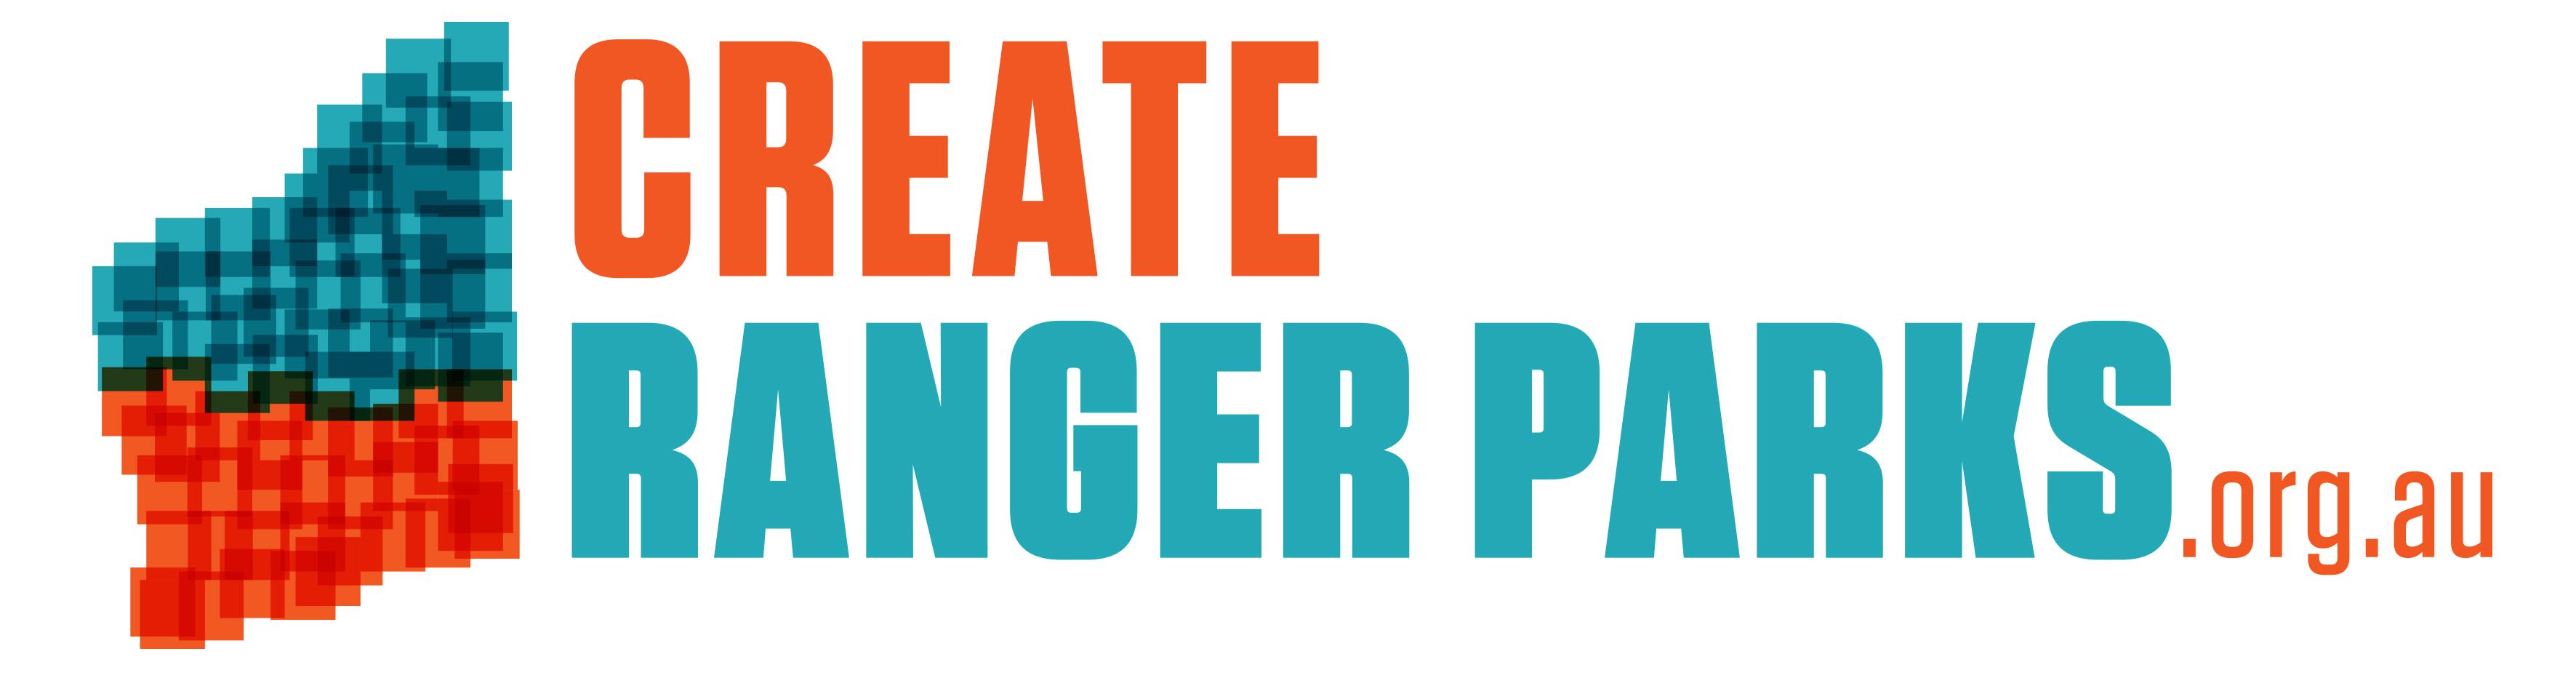 Create_Ranger_Parks_Logo_Horizontal_with_web_address.jpg